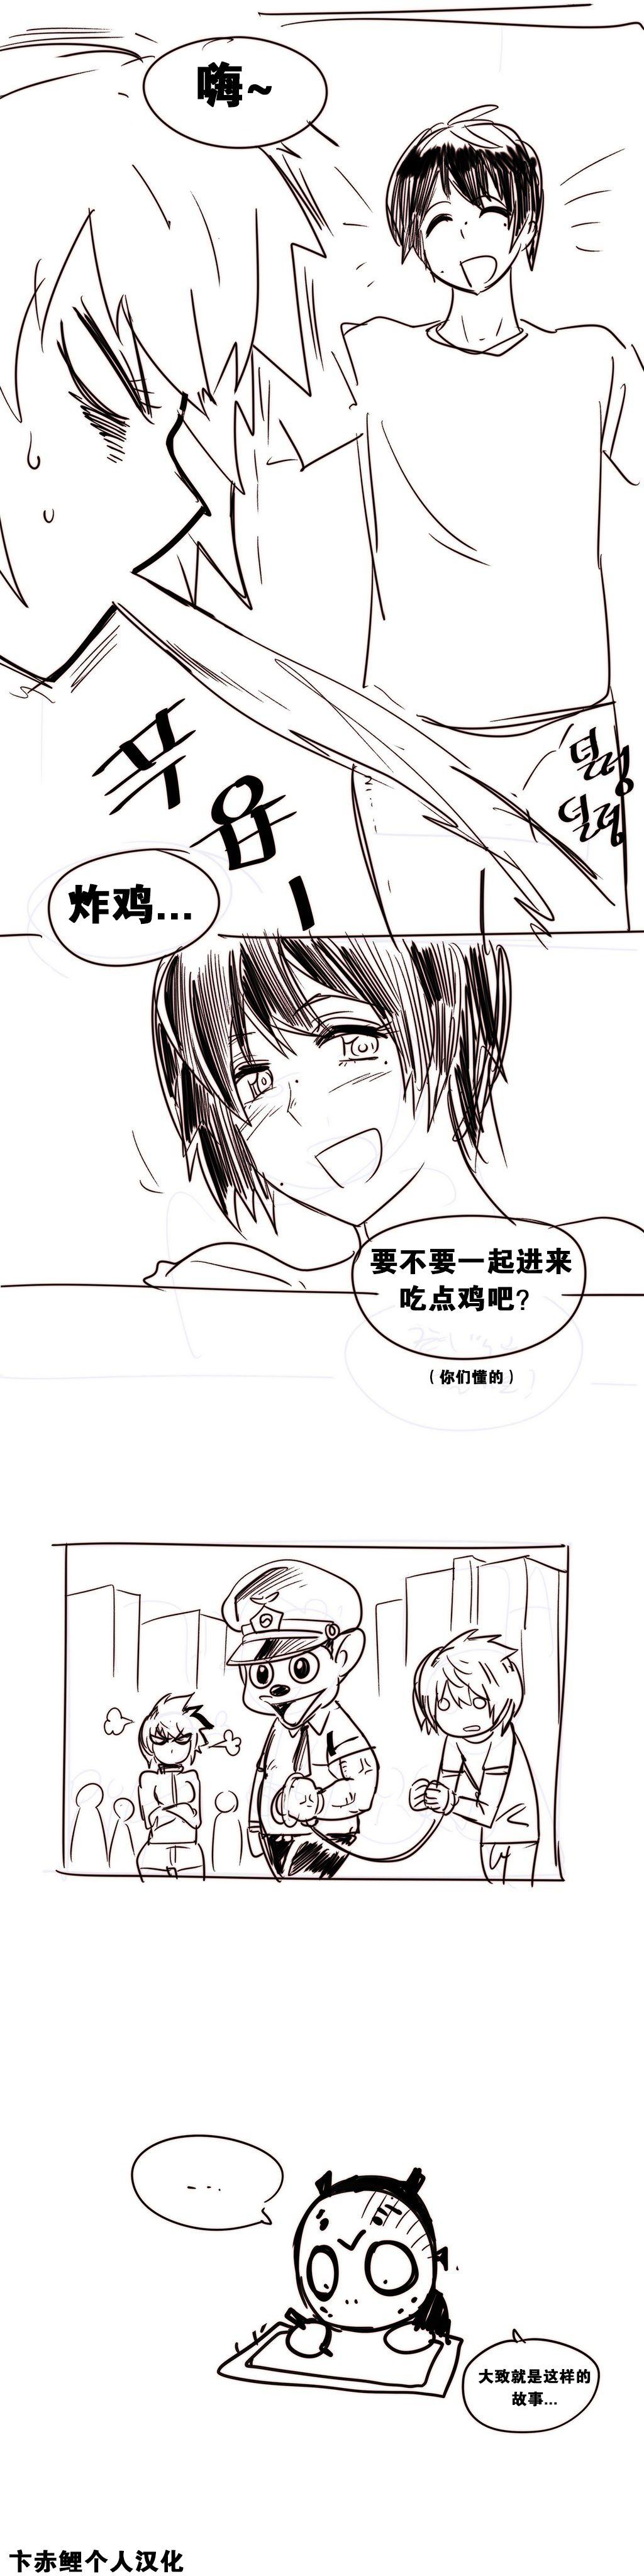 HouseHold Affairs 【卞赤鲤个人汉化】1~33话(持续更新中) 281